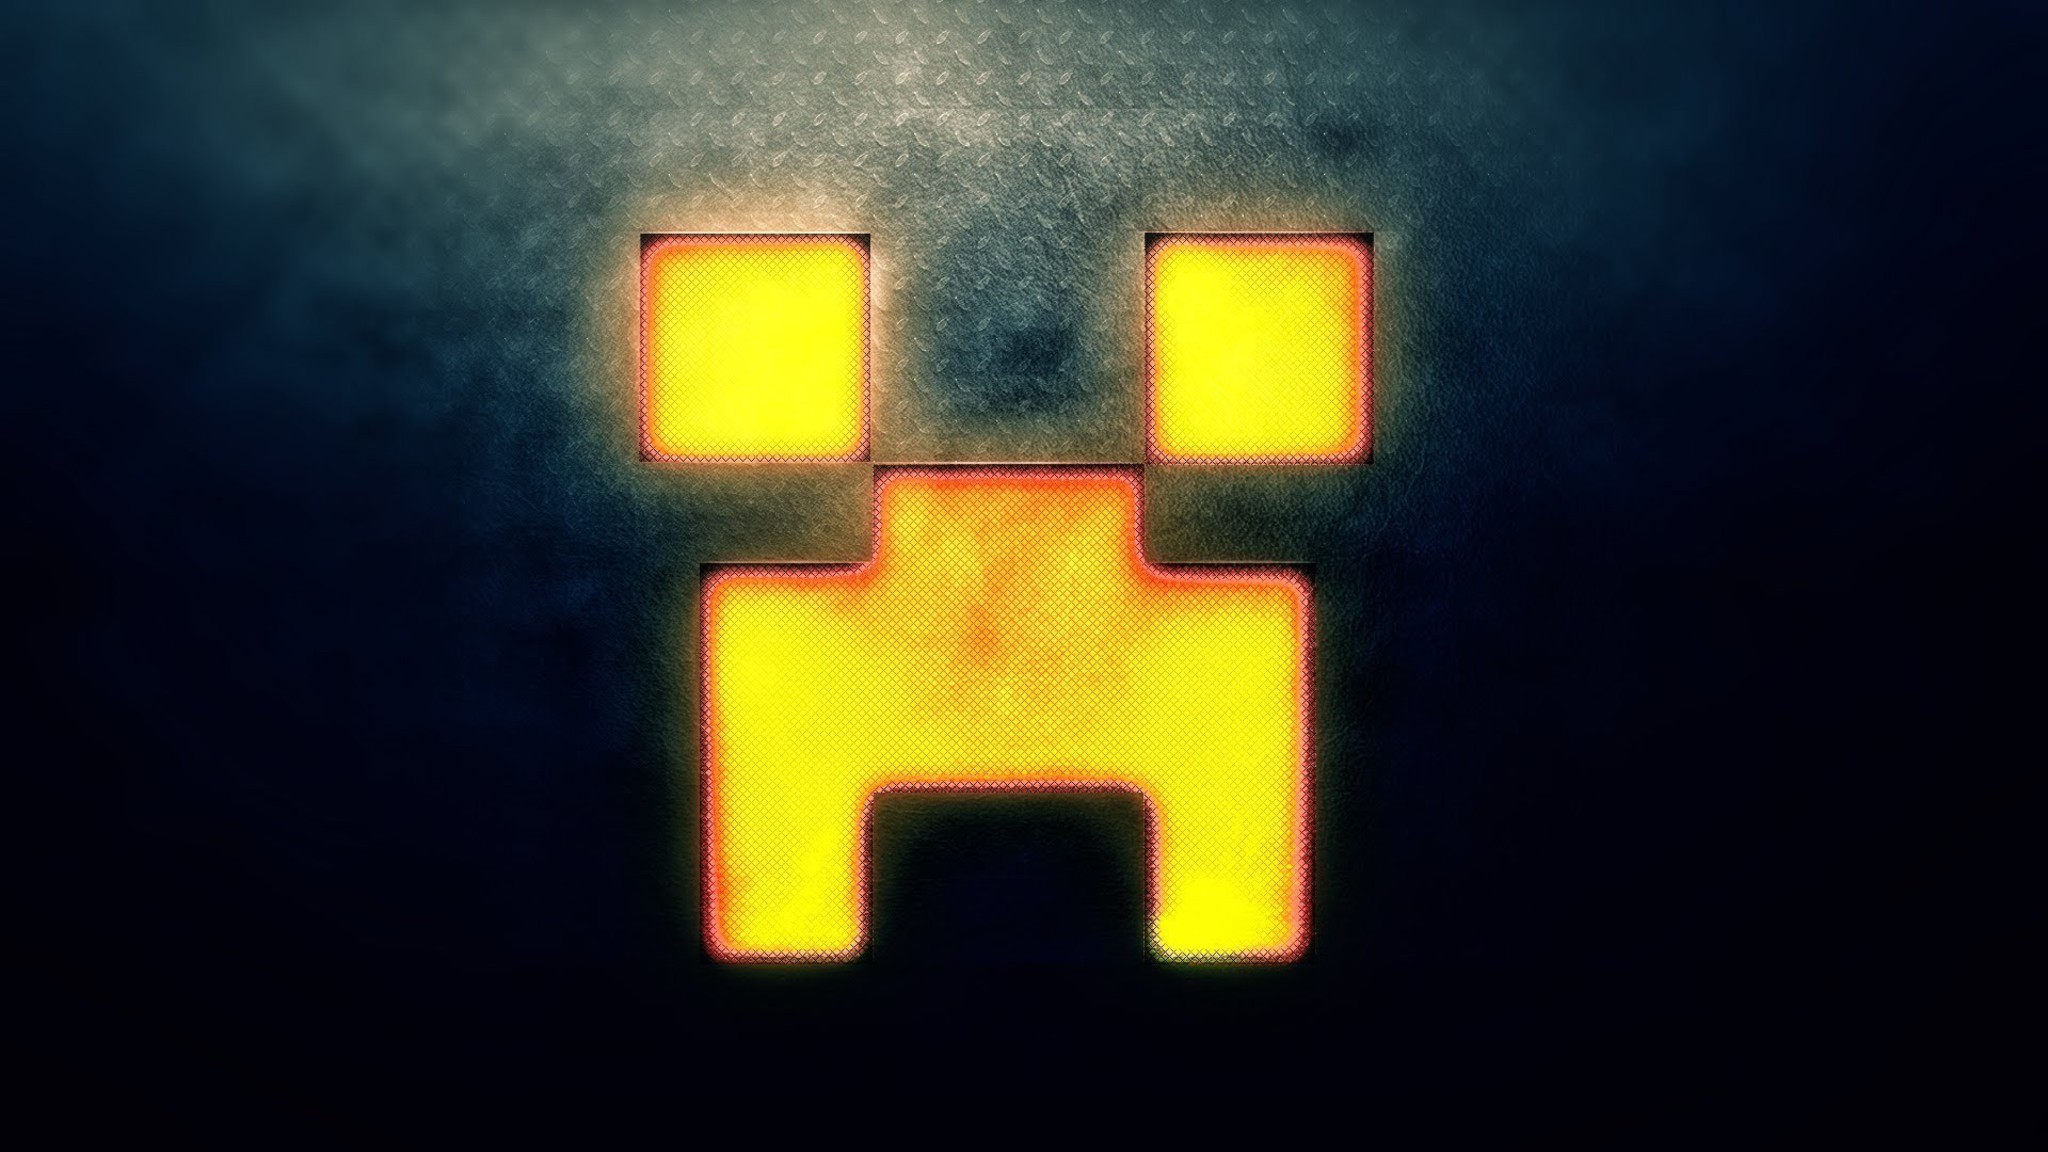 Foto Minecraft 2048 X 1152